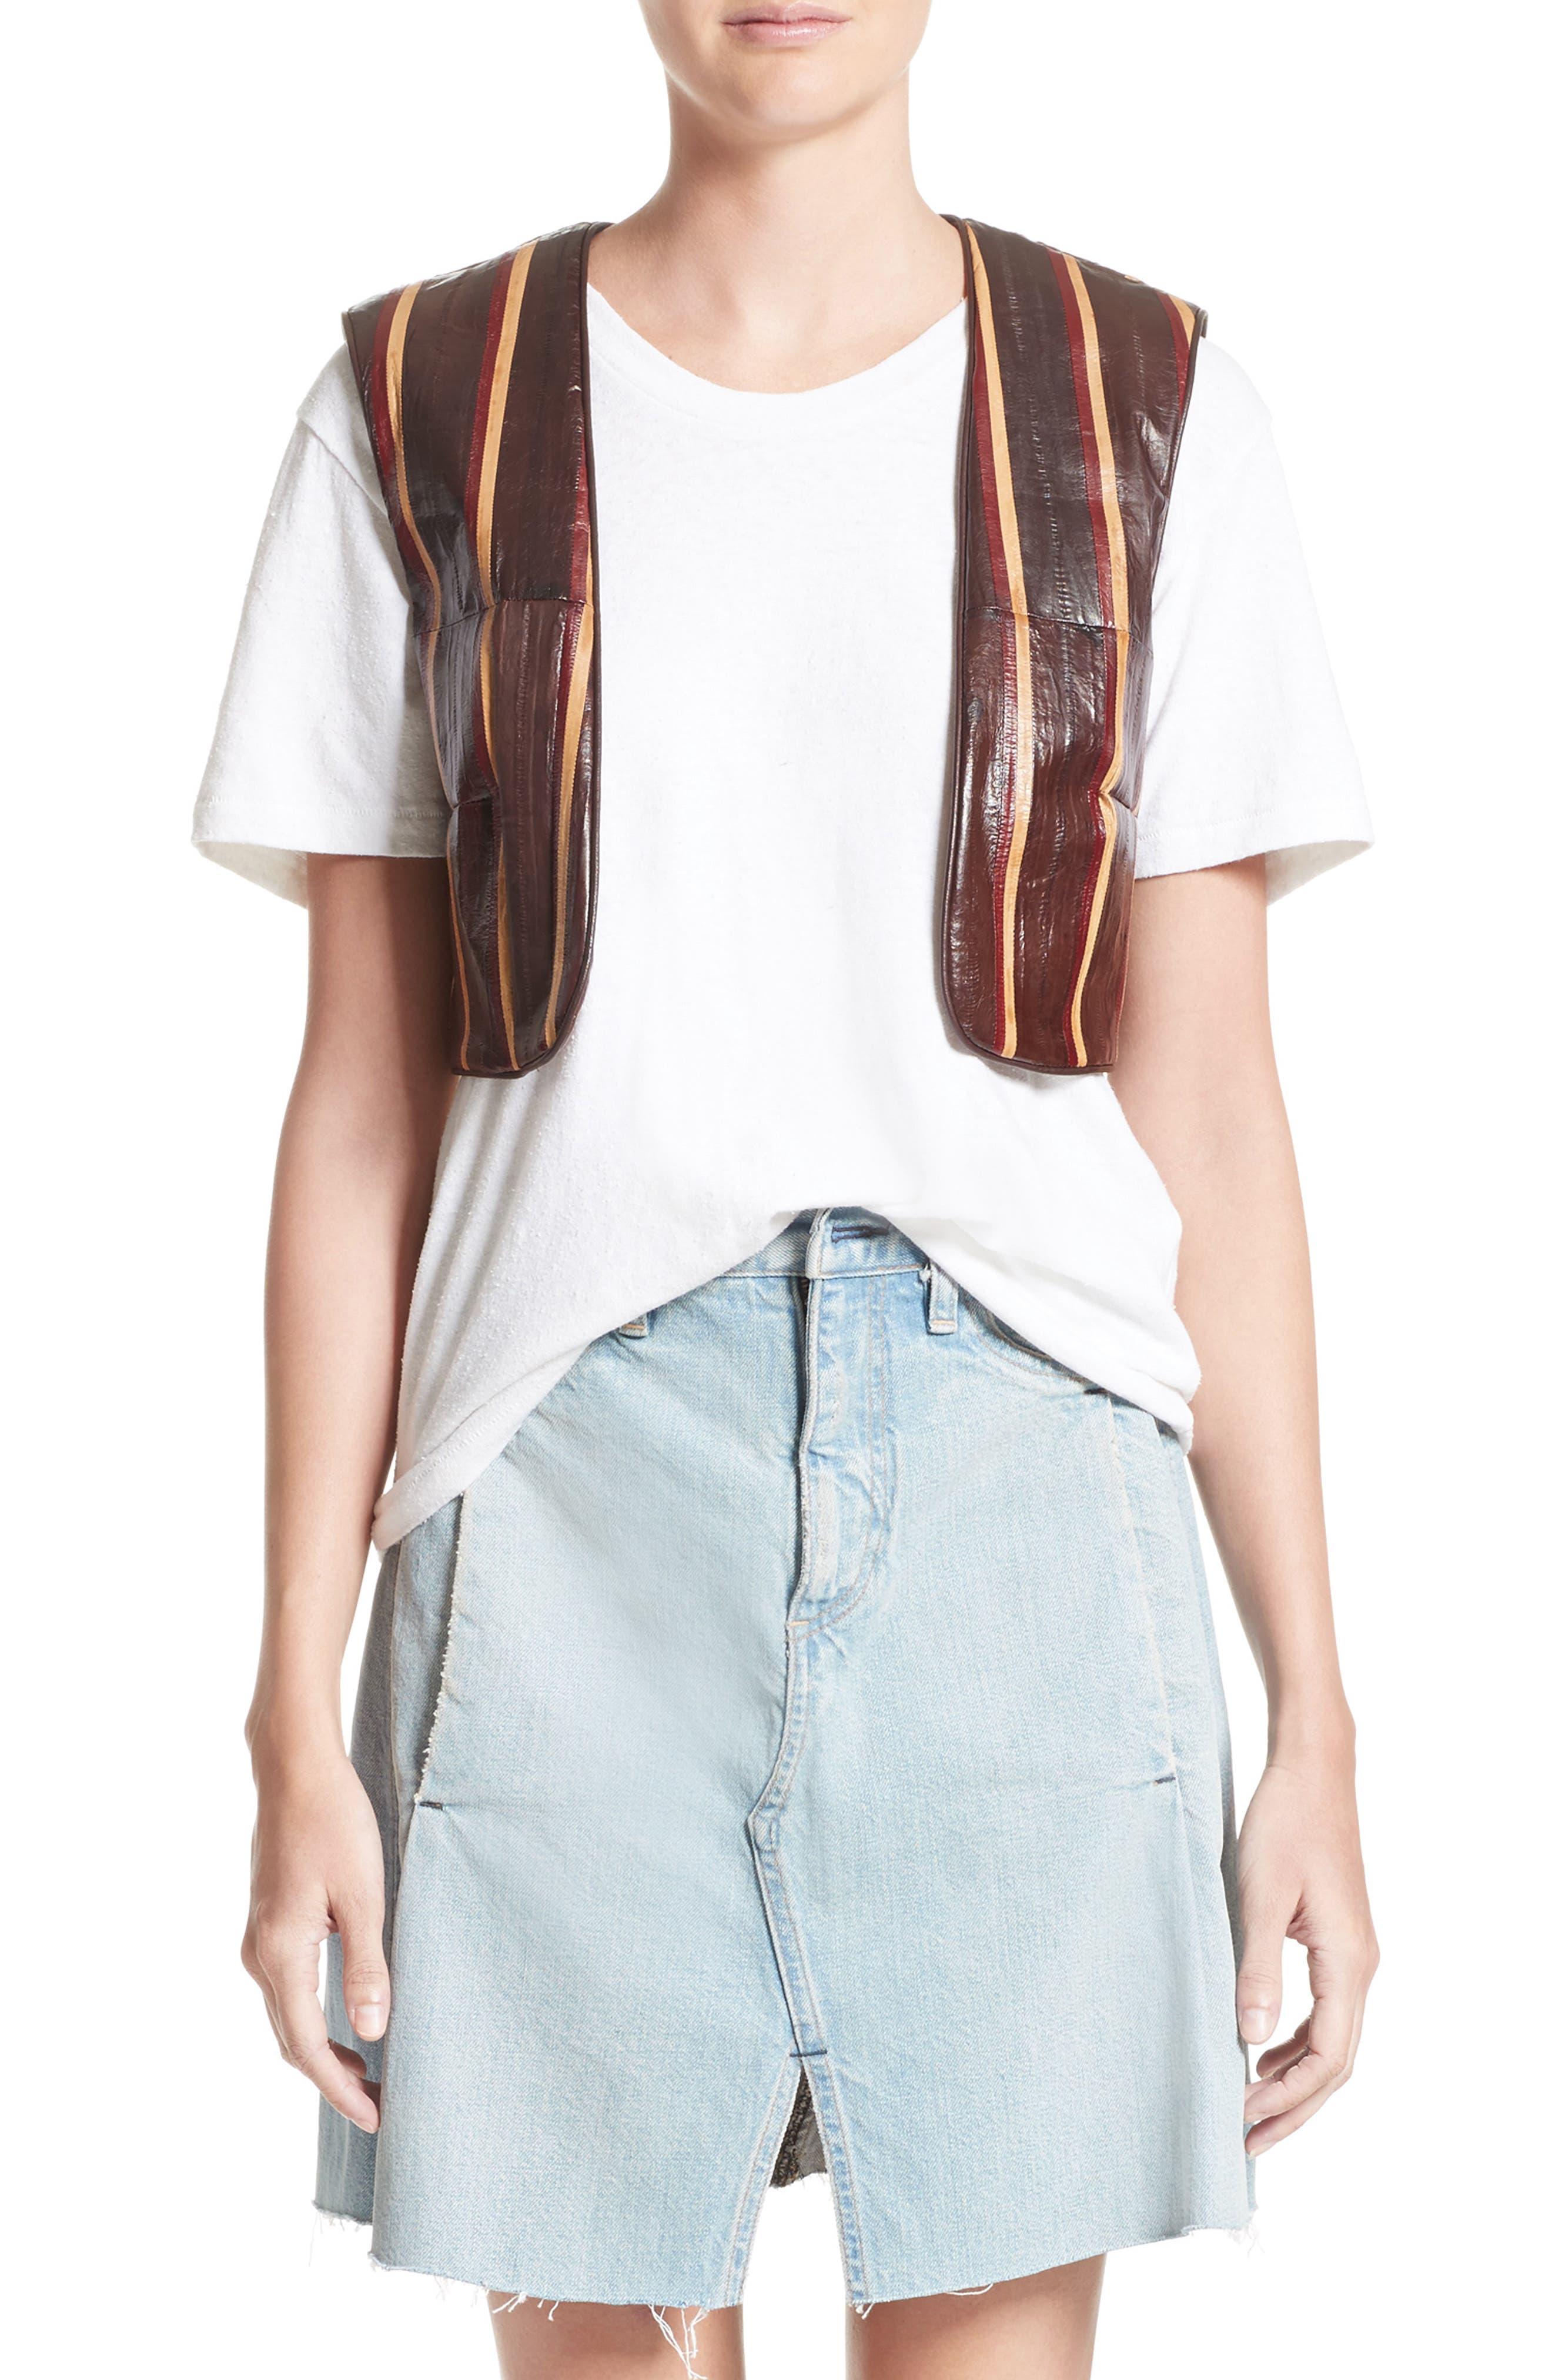 Alternate Image 1 Selected - Simon Miller Striped Genuine Eelskin Vest (Nordstrom Exclusive)